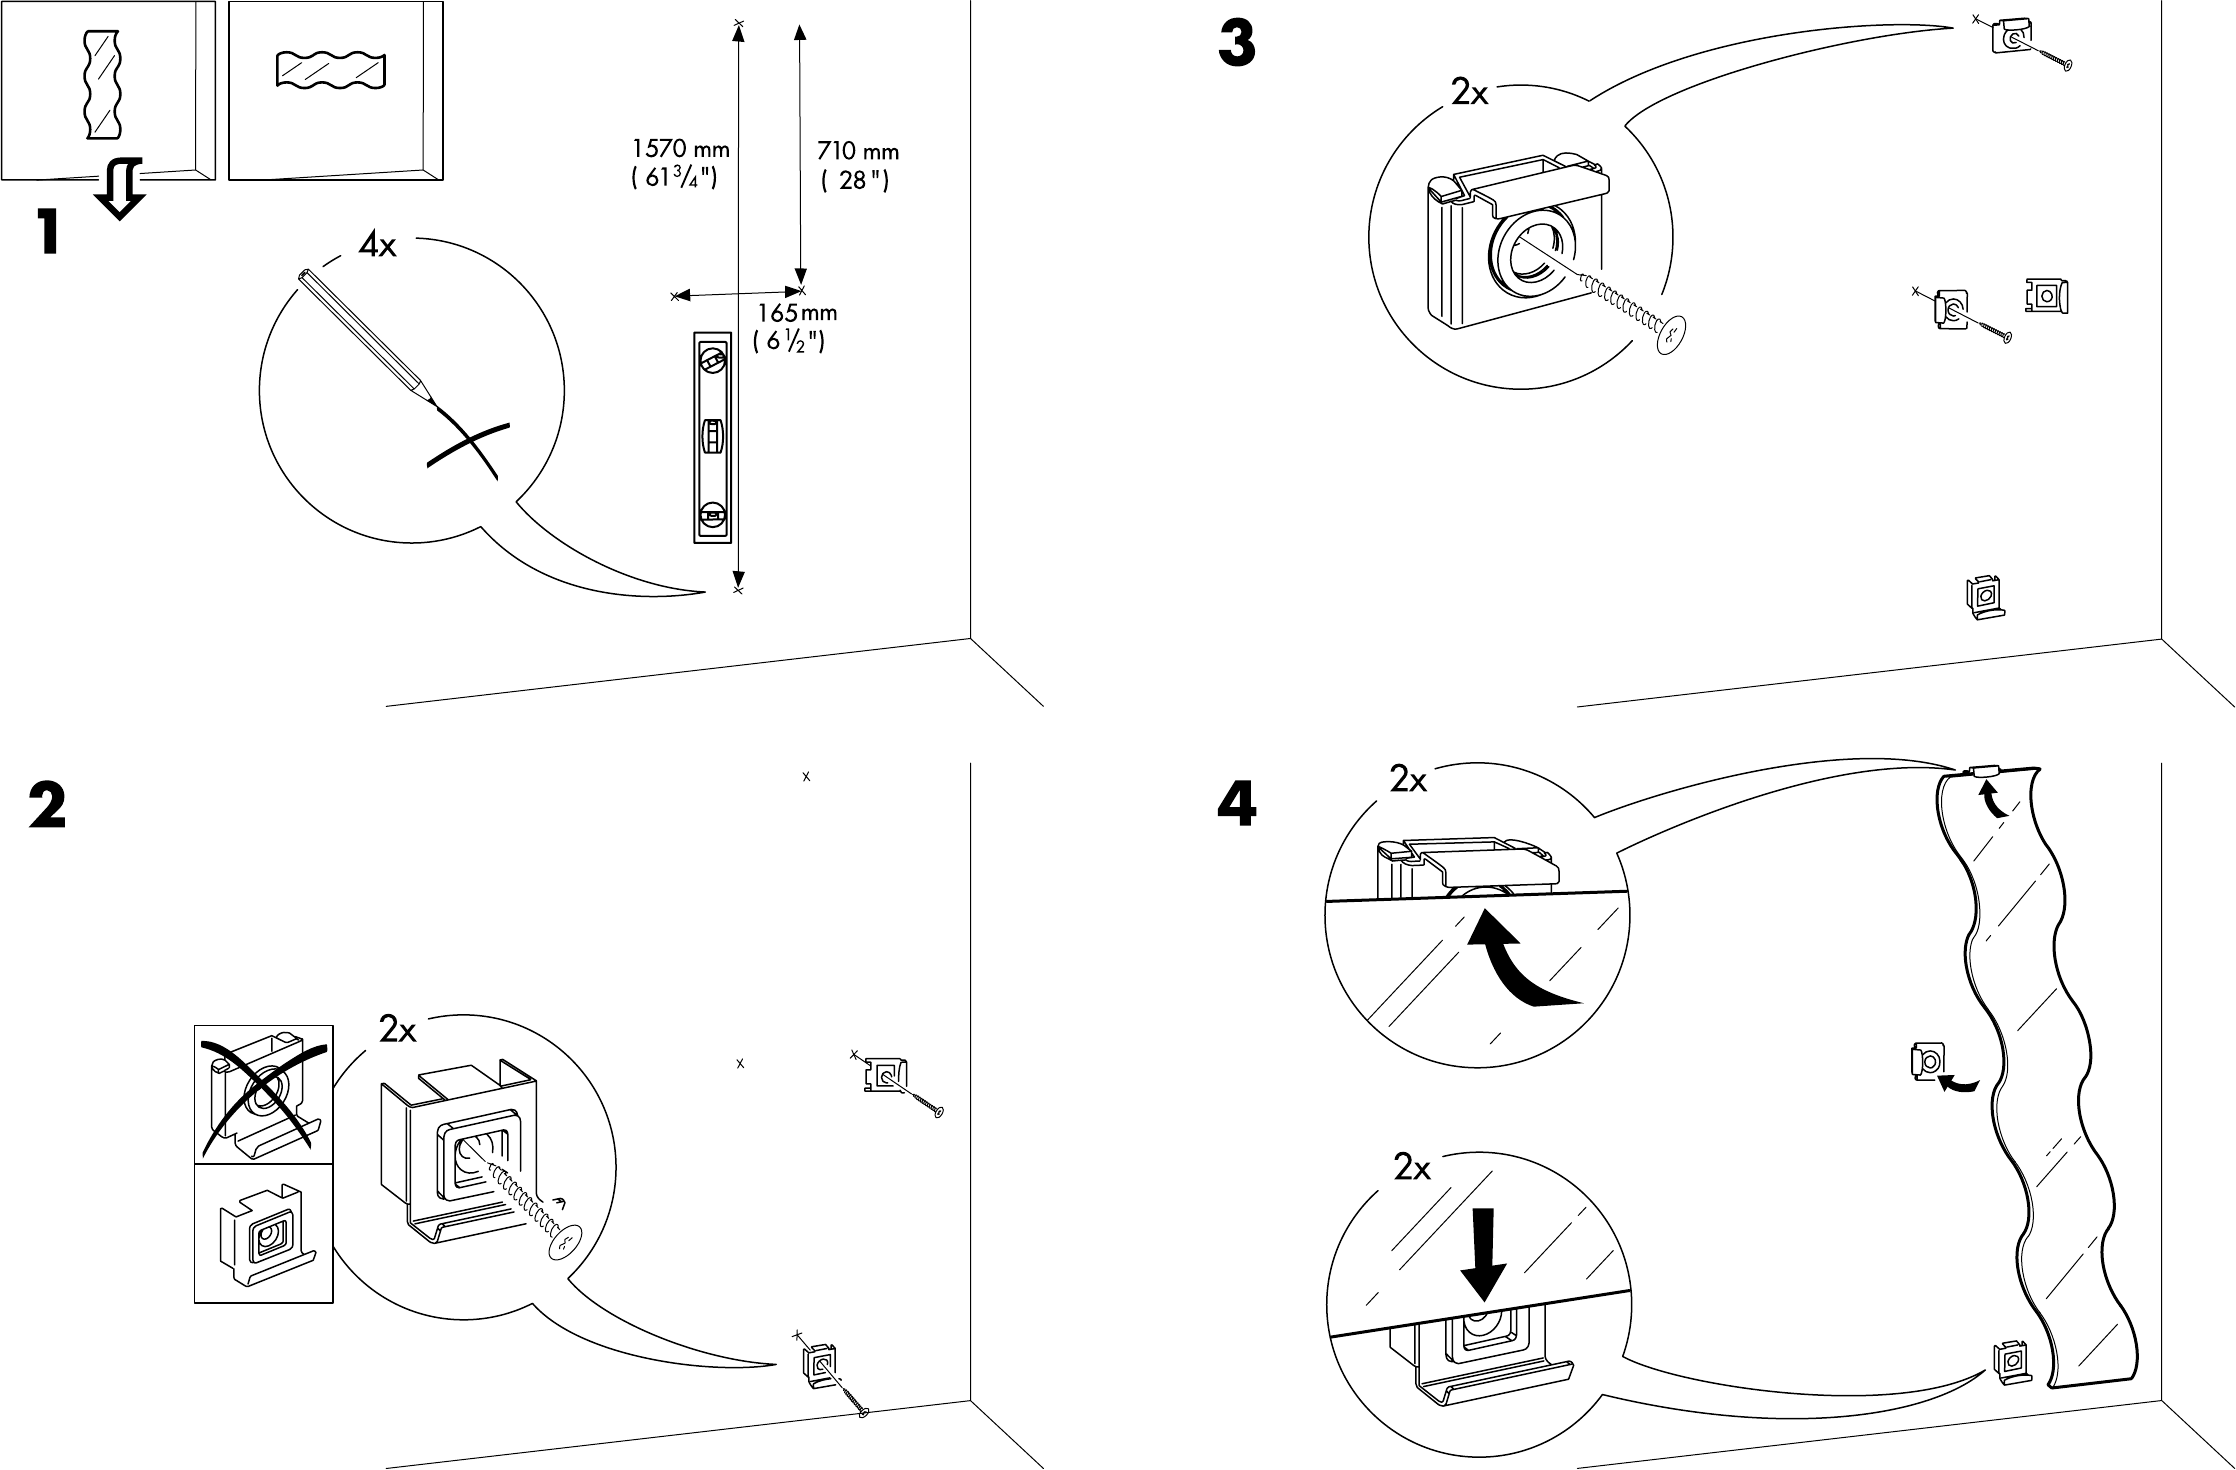 Ikea Spiegel Krabb Befestigung – Wohn-design